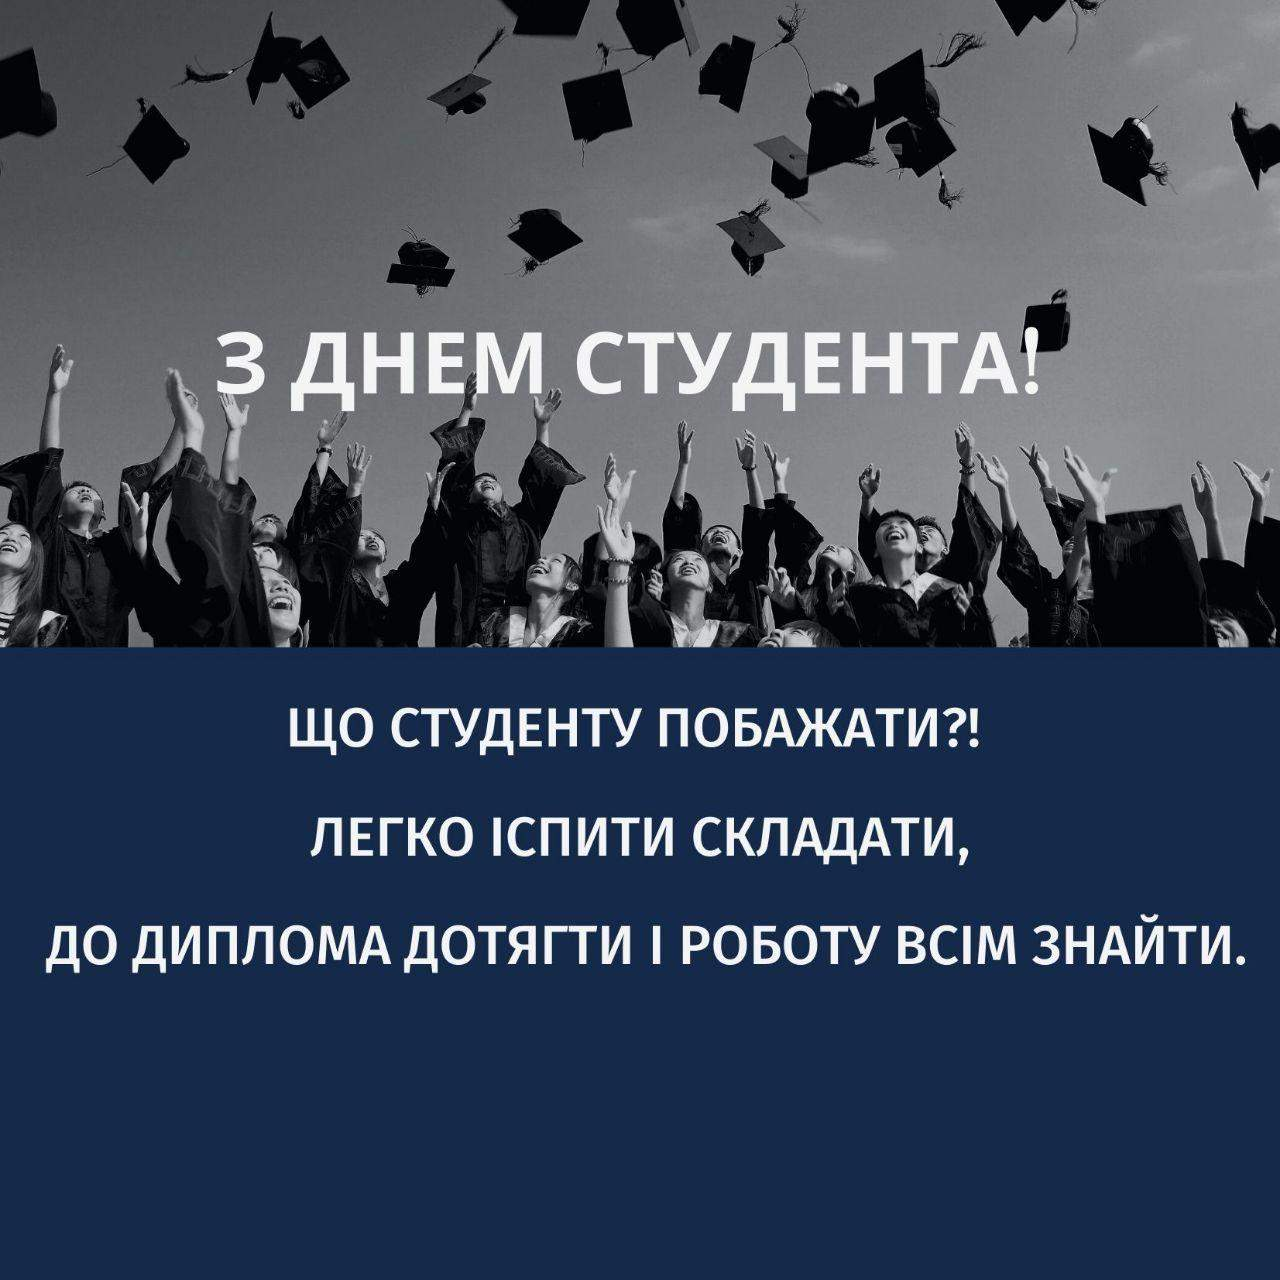 Картинки з Днем студента